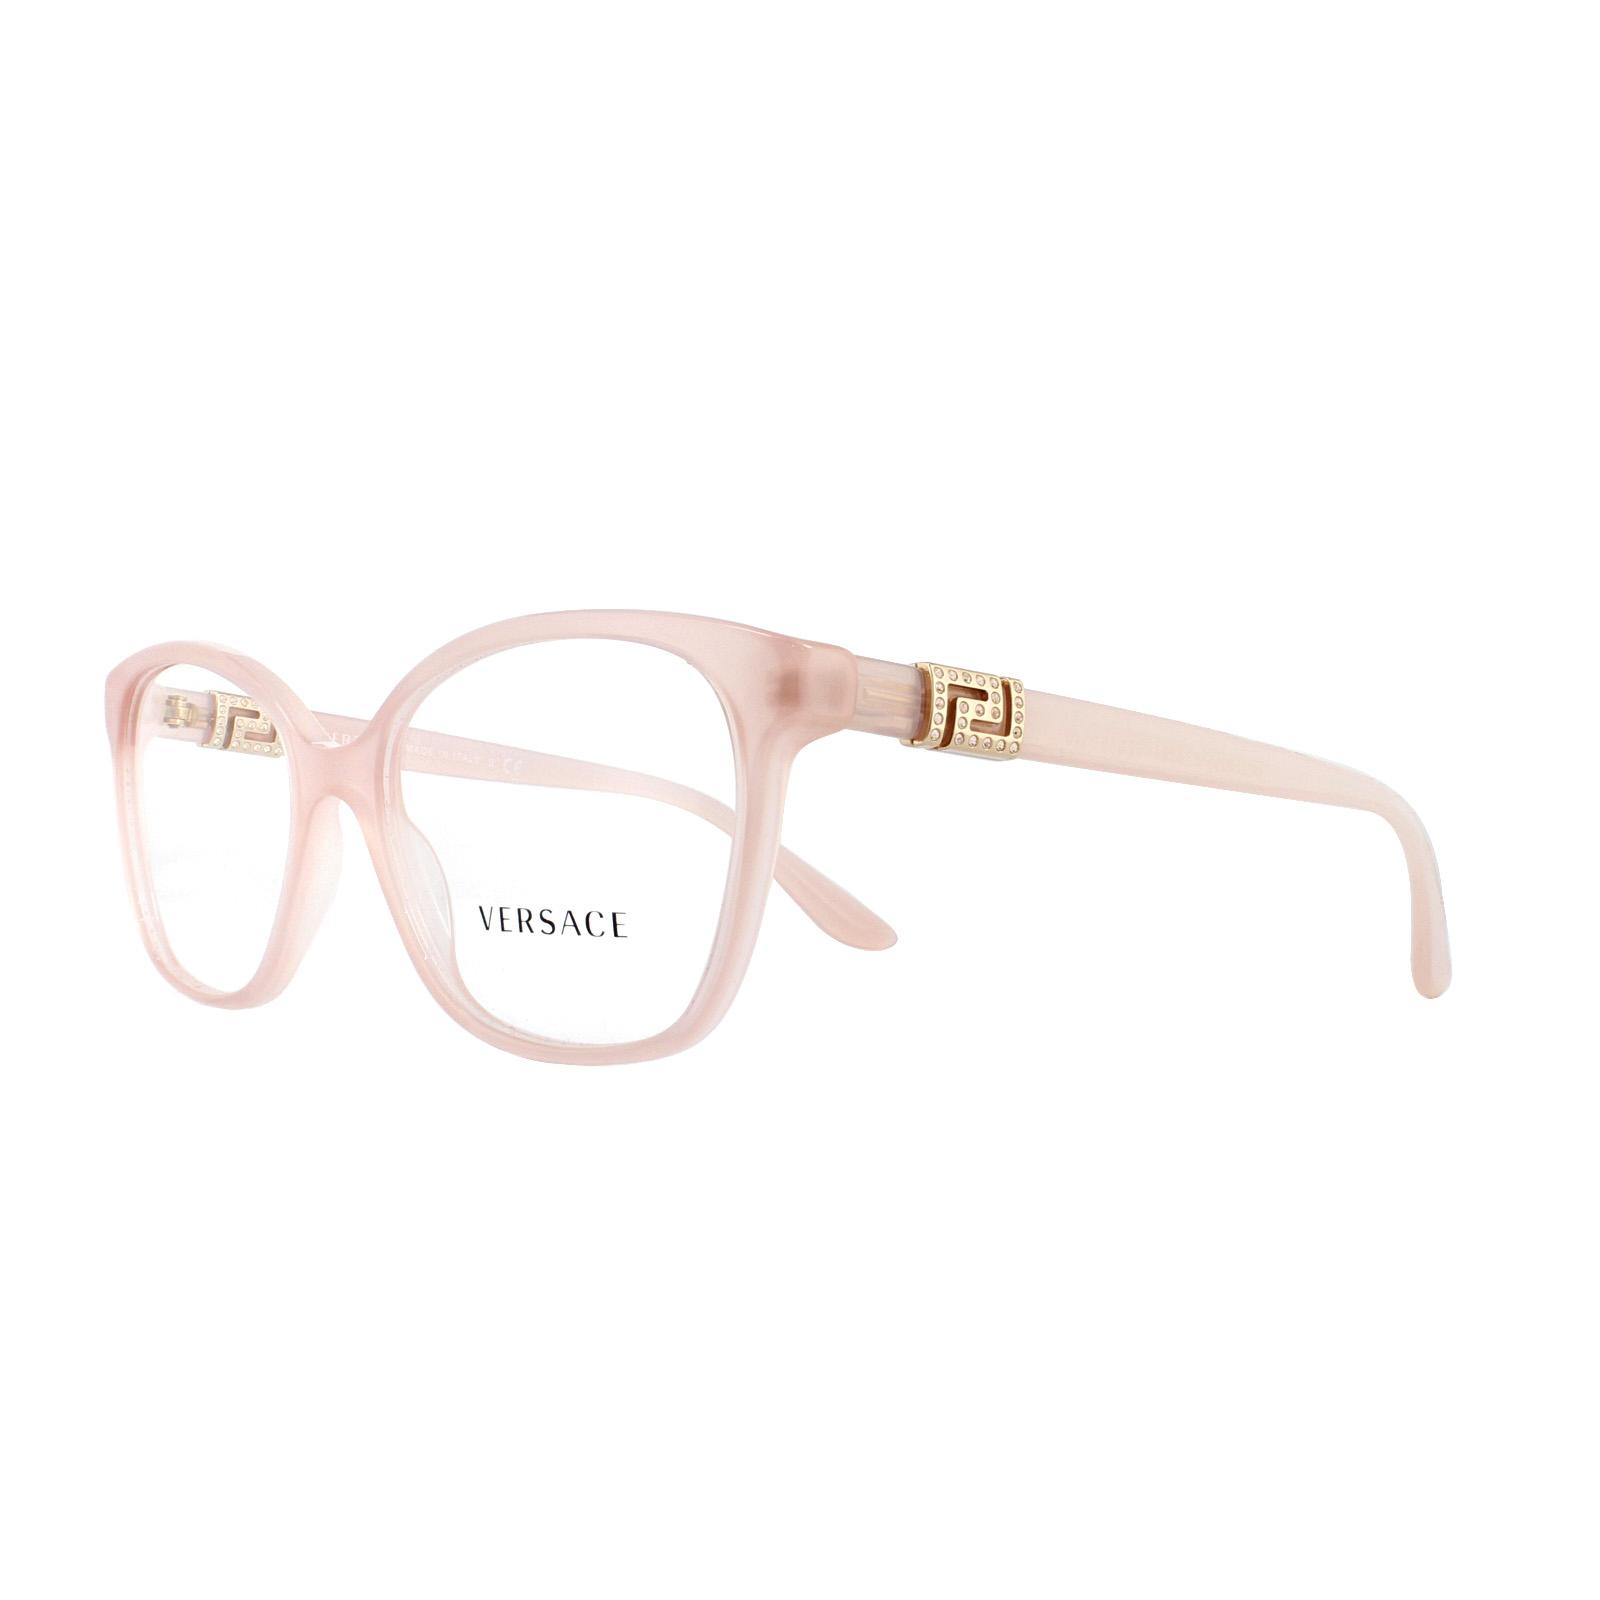 6f404598541e Sentinel Versace Glasses Frames 3235B 5224 Opal Powder 54mm Womens